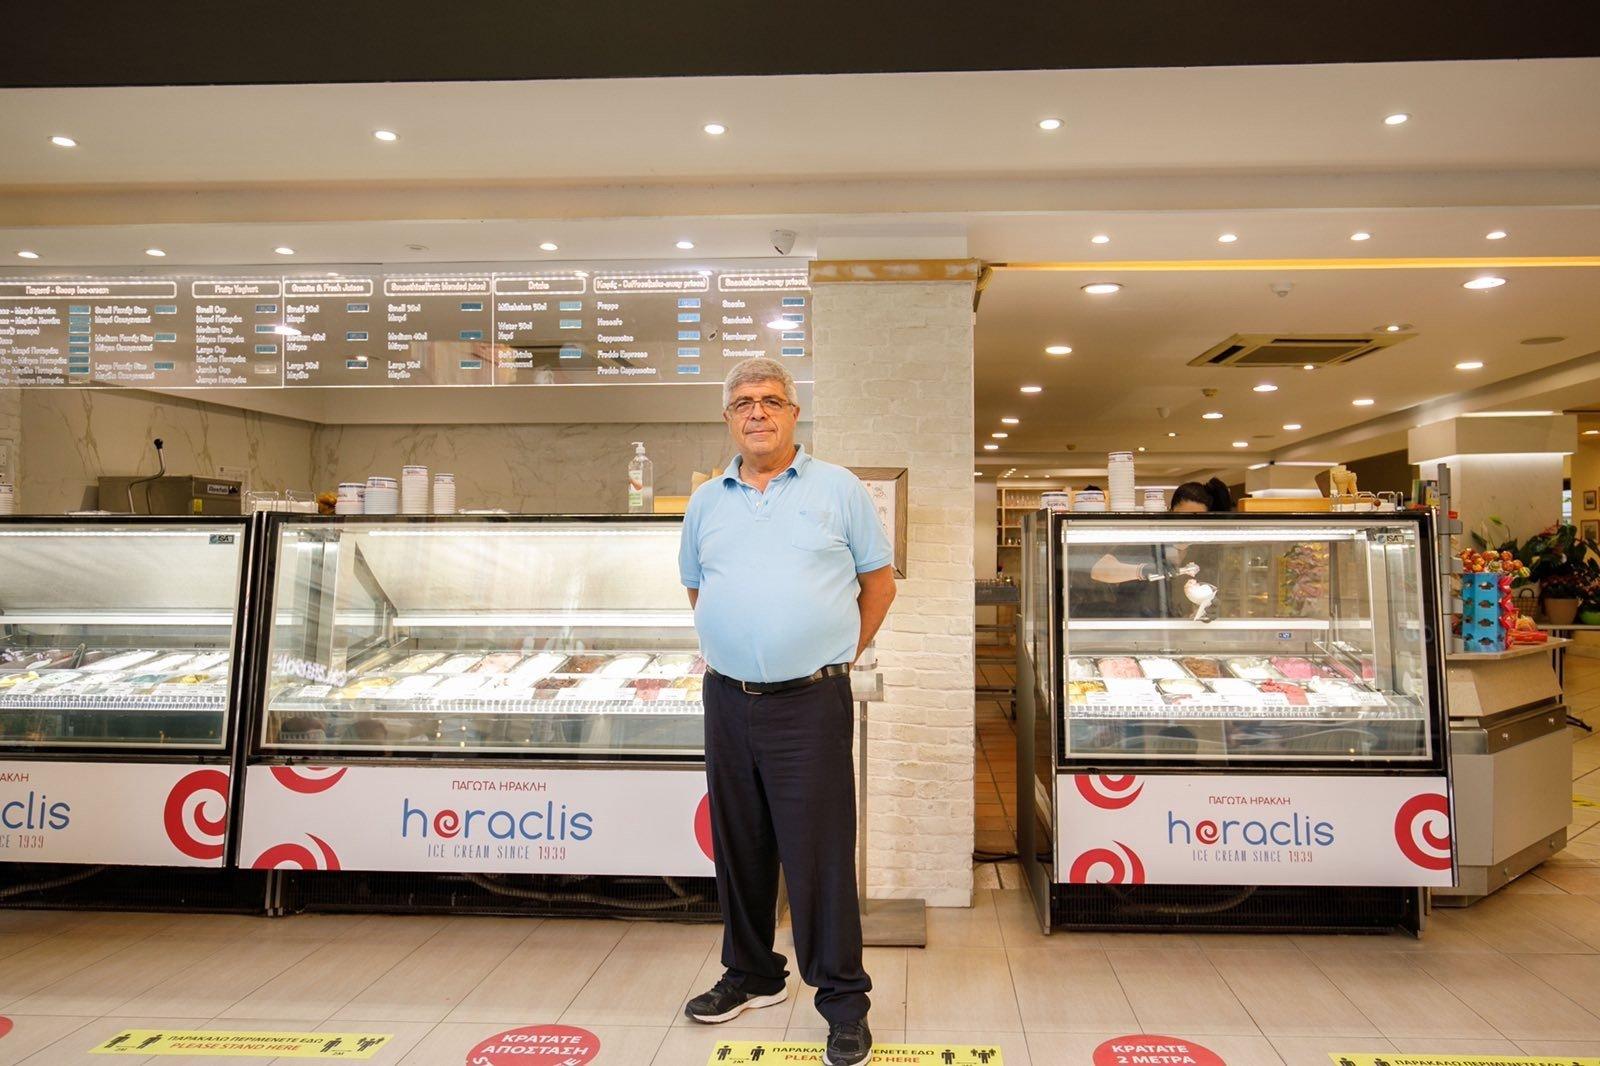 «O Heraclis ξεκίνησε την αγορά παγωτού στην Κύπρο»